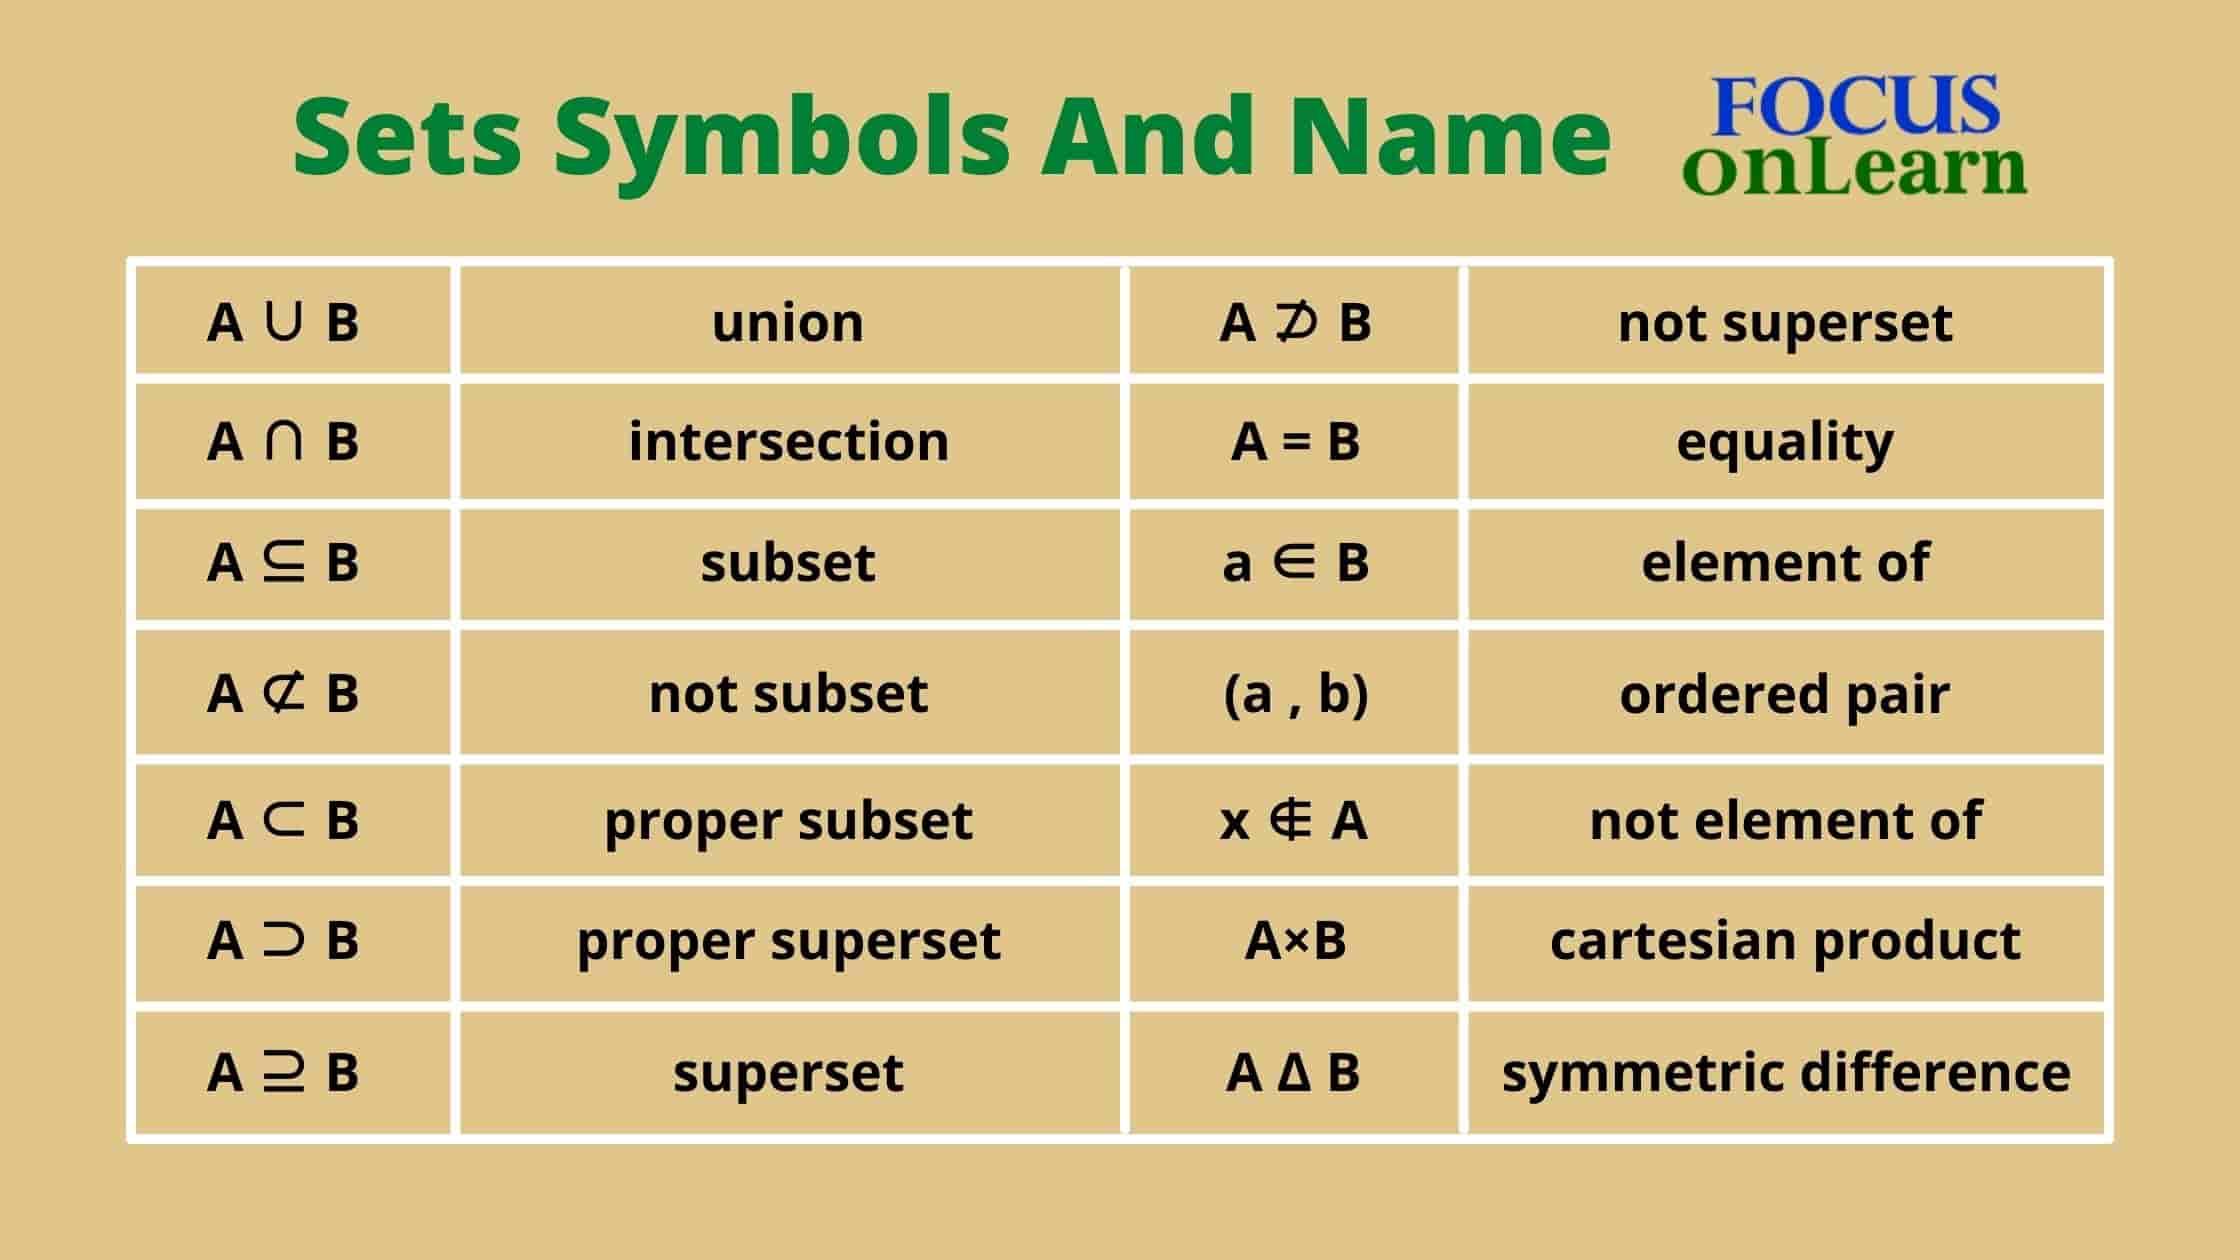 Sets Symbols and Name